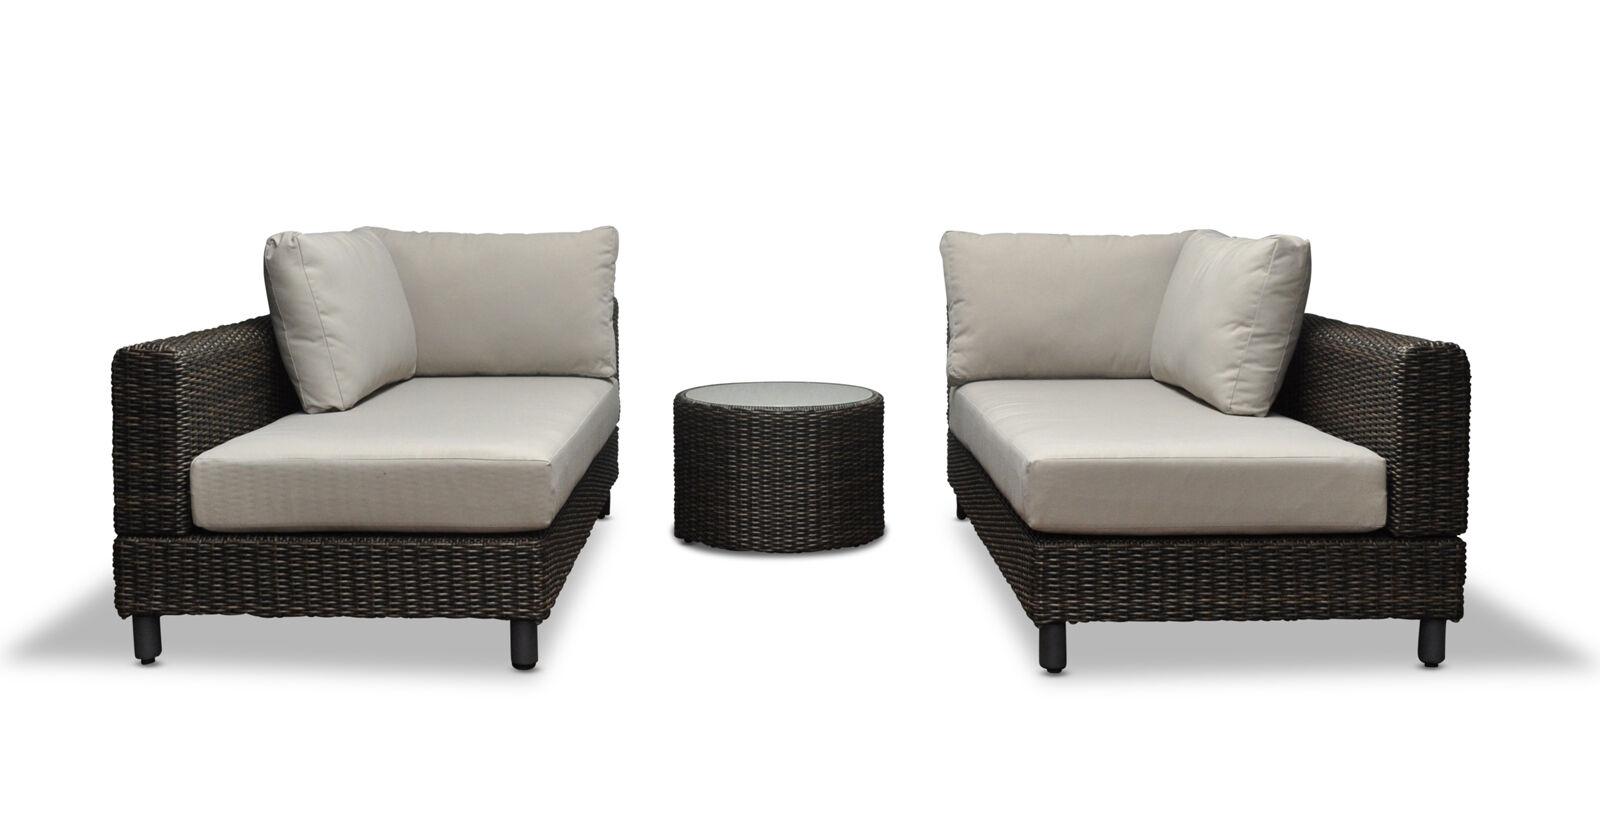 Modular Wicker Outdoor Corner Sofa Chaise Sun Lounge Daybed Rattan Furniture Set Aud 1